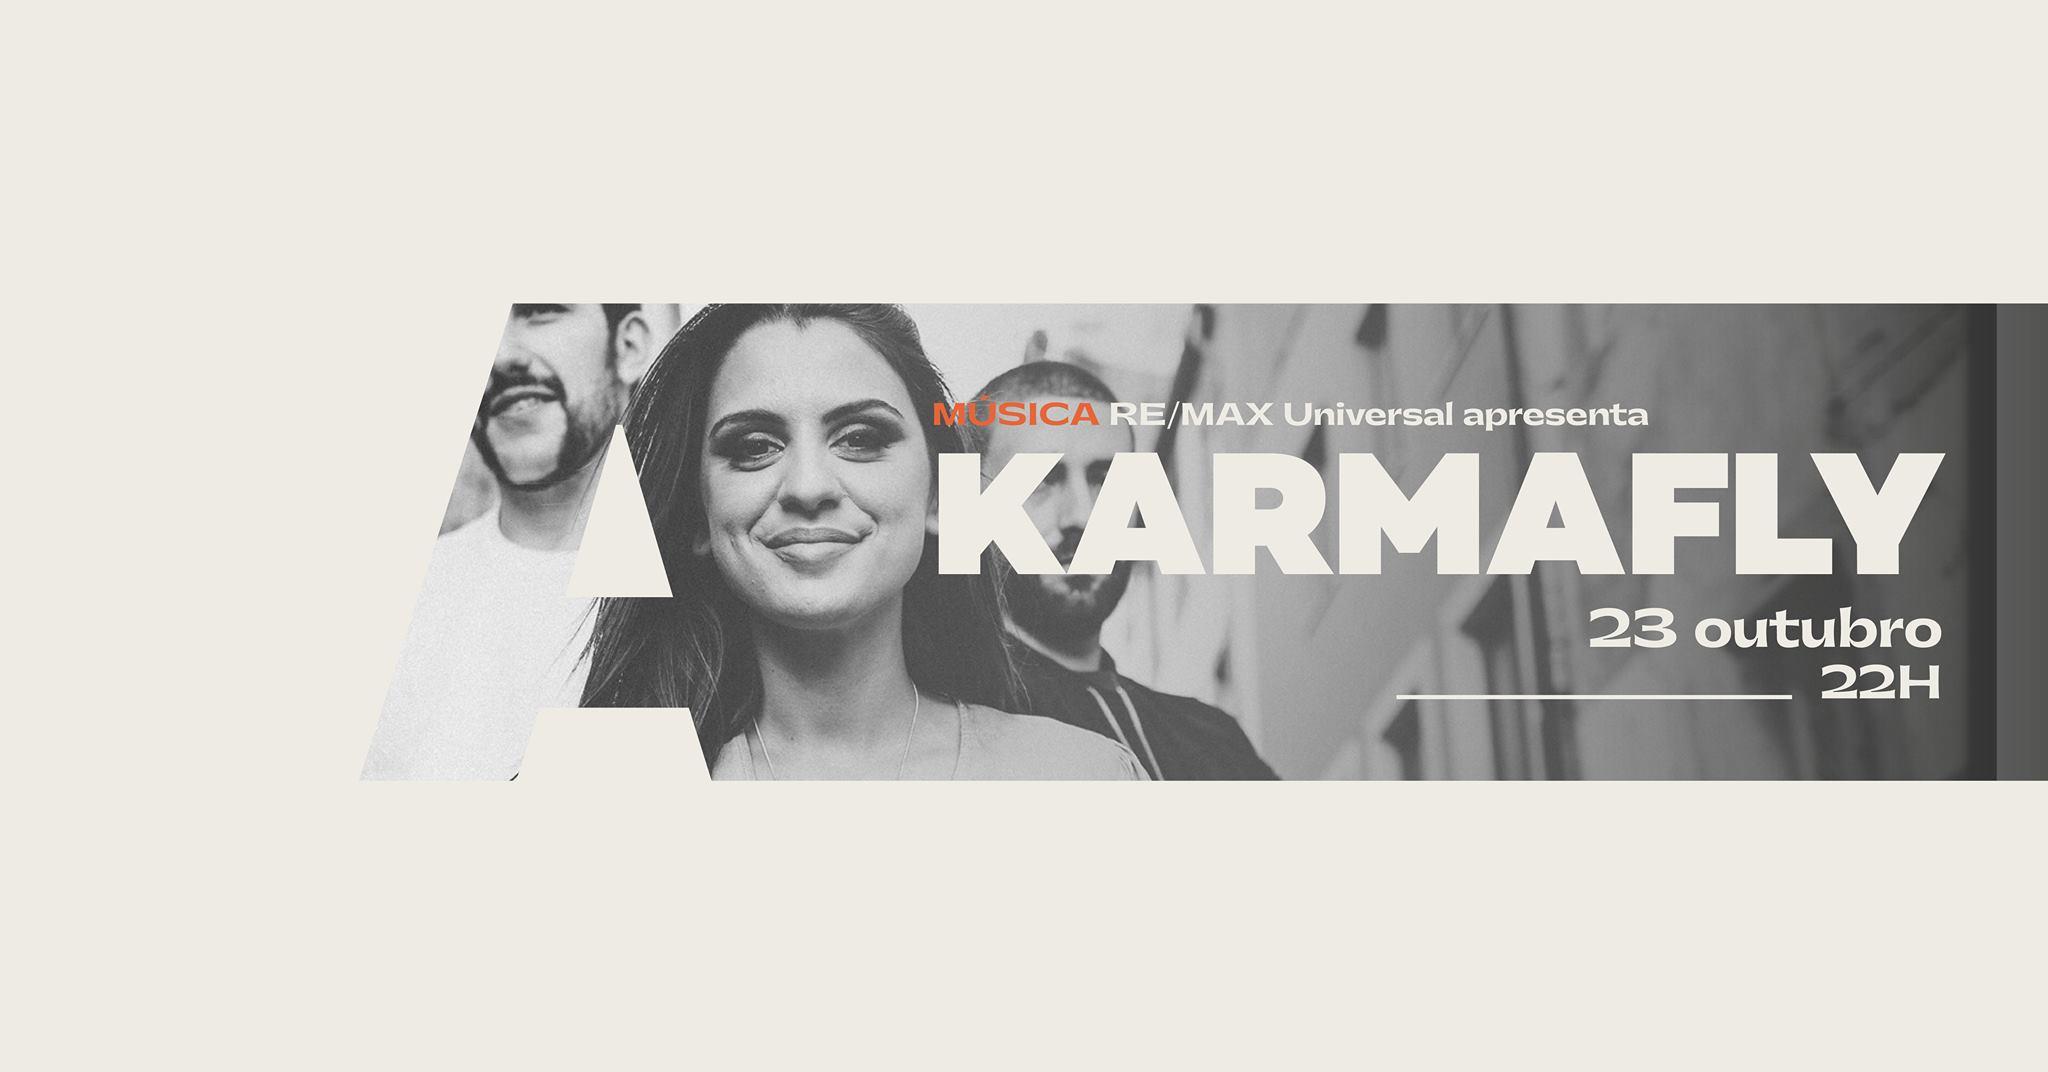 Re/Max Universal apresenta KarmaFly @Avenida Café-Concerto